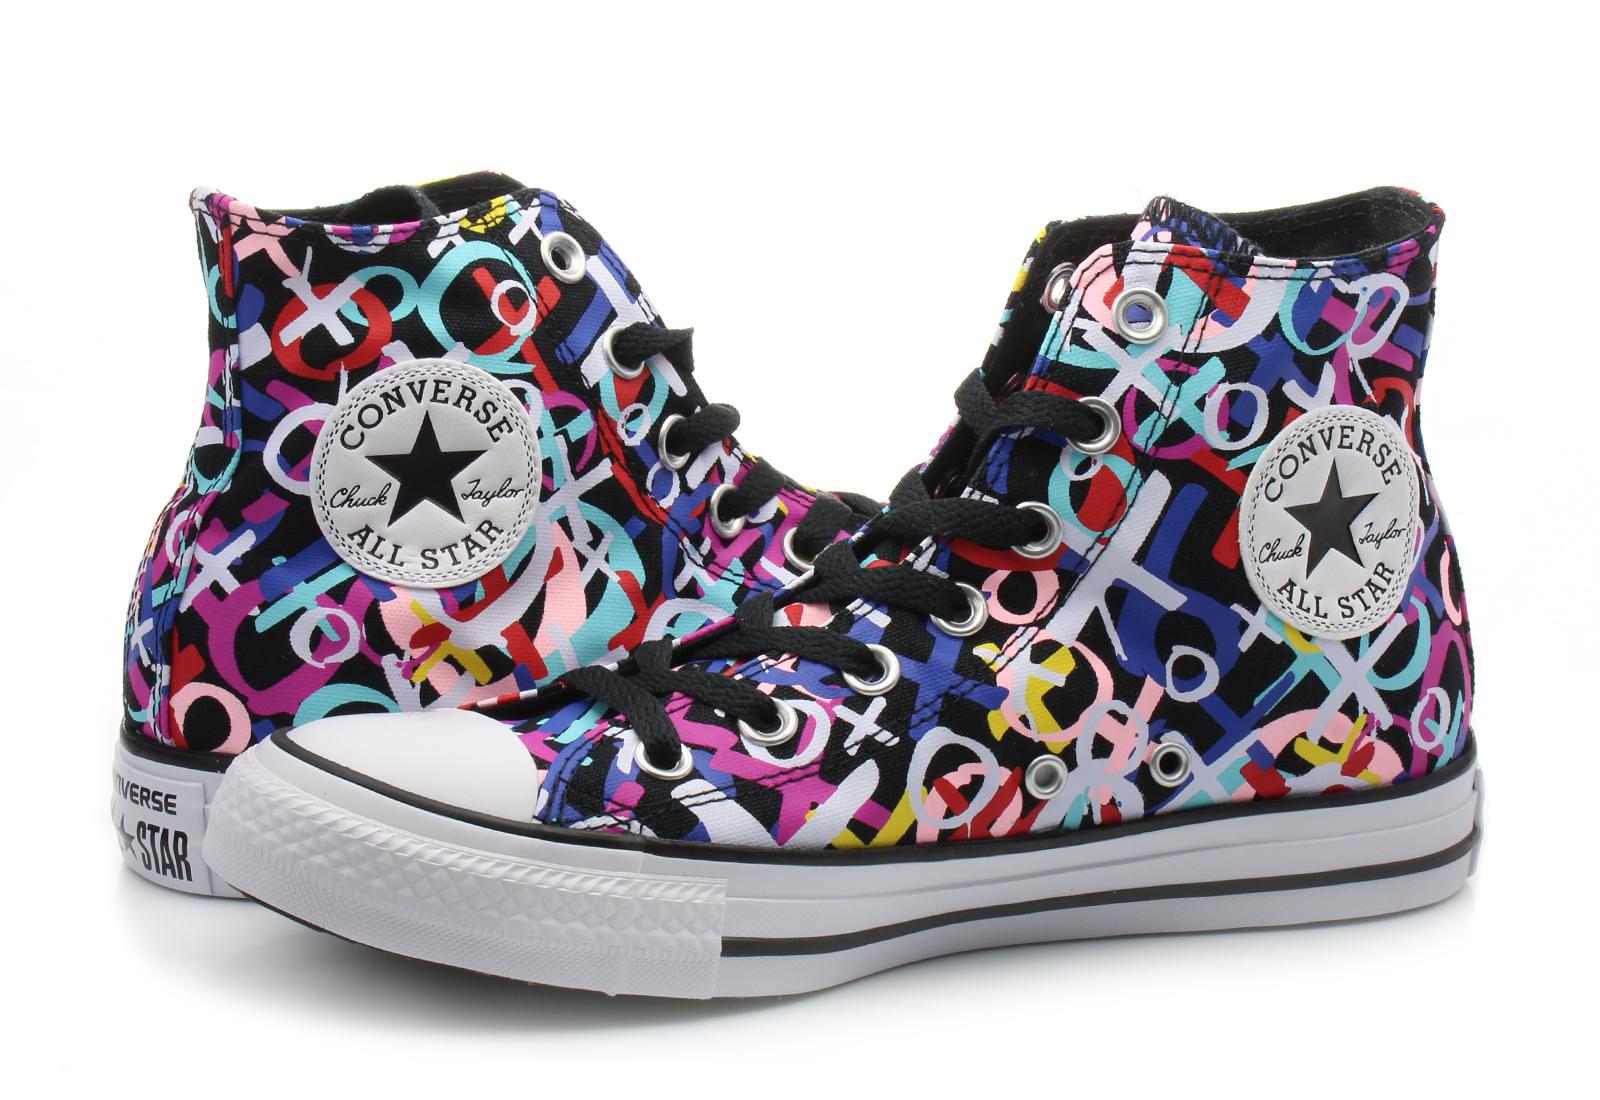 Converse Visoke Cipele Crne Tenisice - Chuck Taylor All Star Print Hi - Office  Shoes - Online trgovina obuće 5df759e3d4a